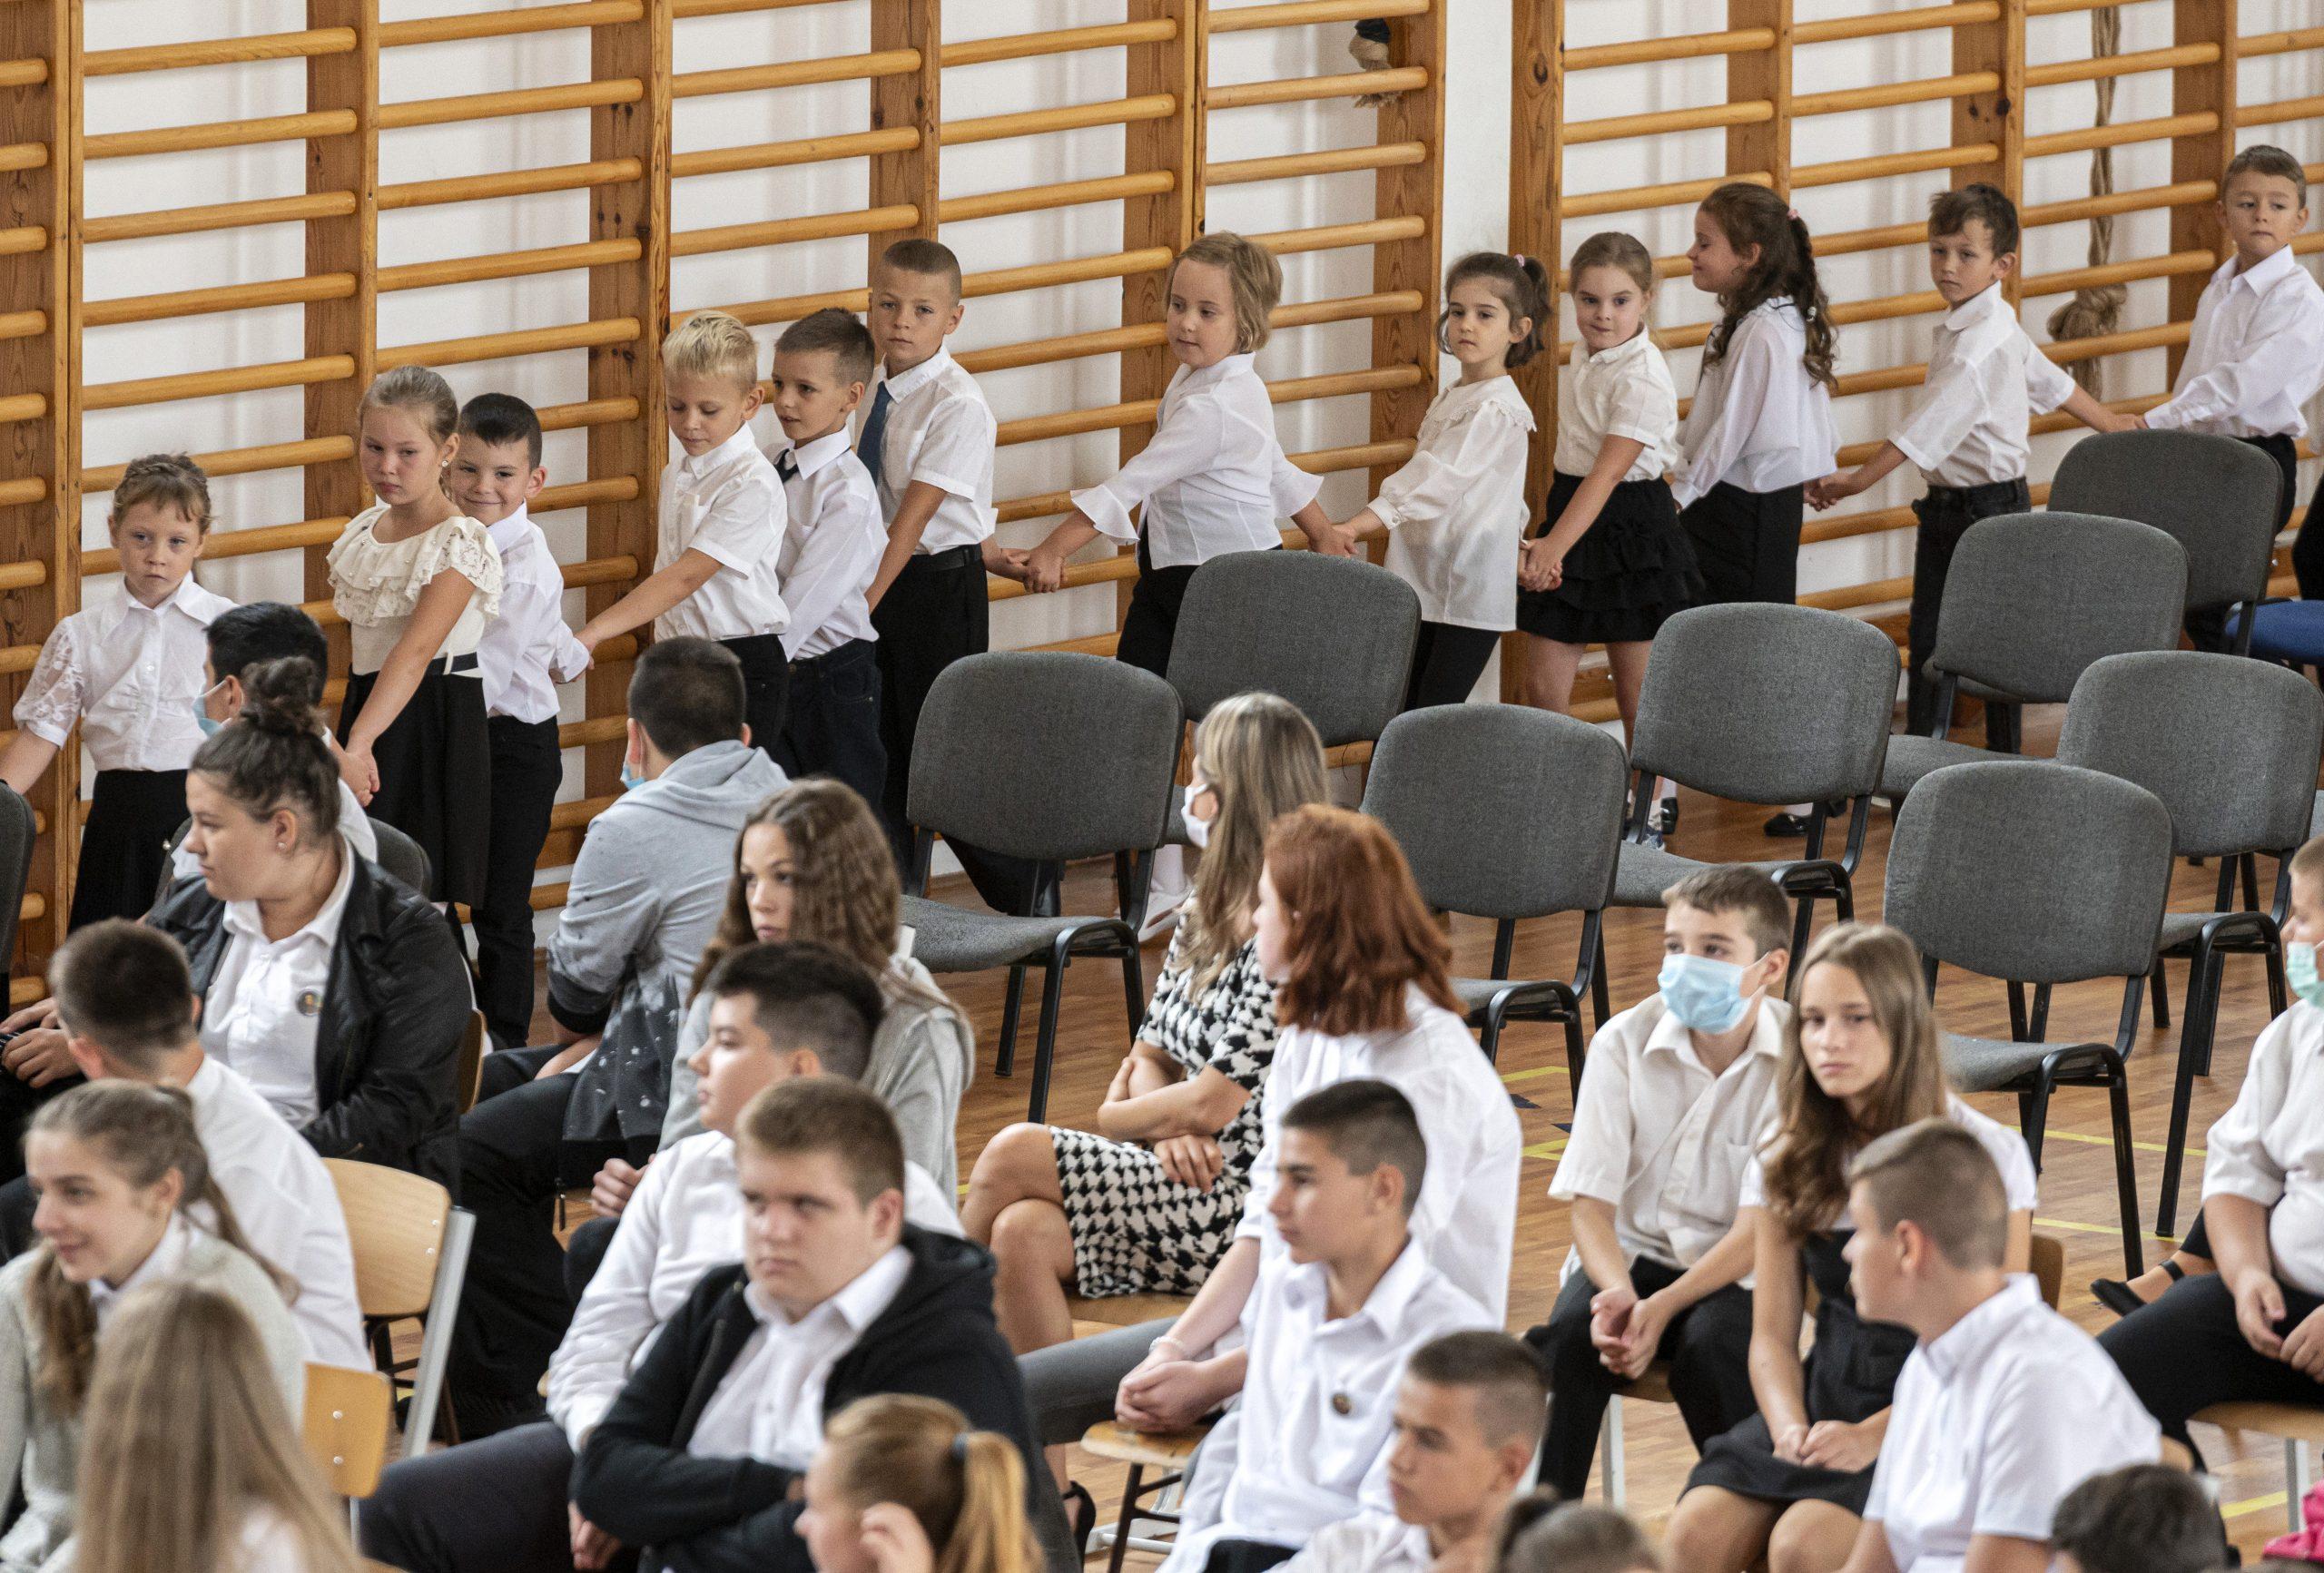 Hungarian Press Roundup: School Year Starts amid Coronavirus Doubts